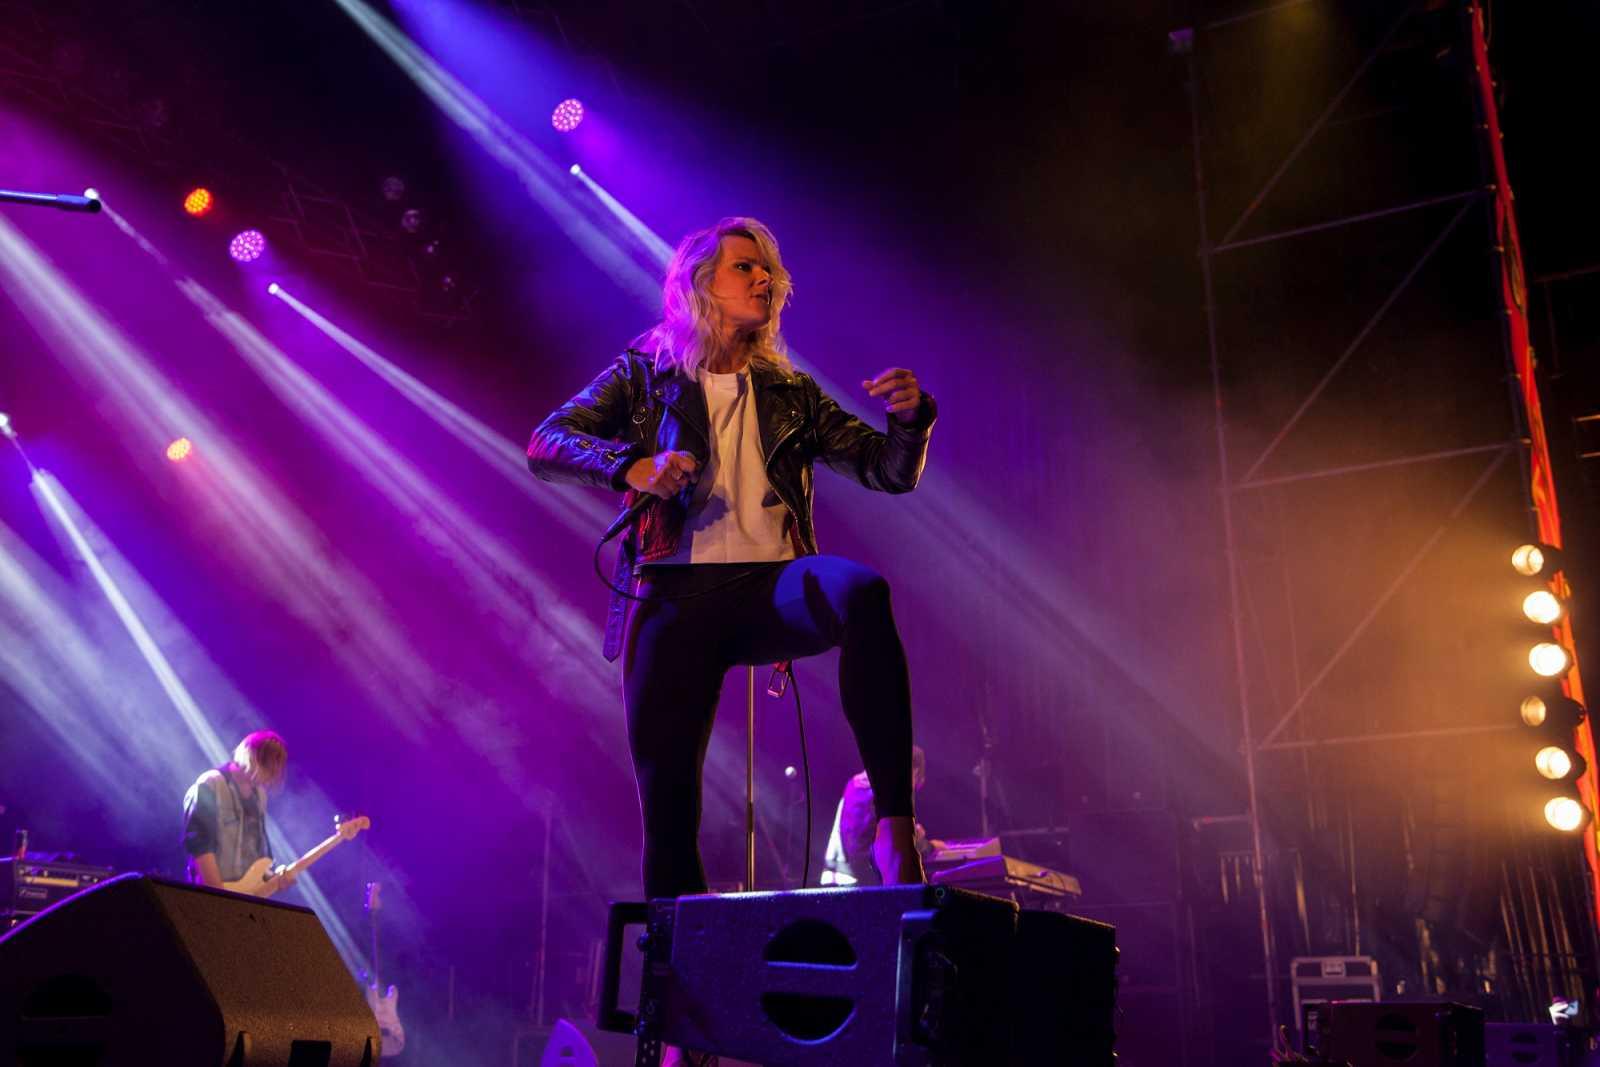 Festivales - Festival Noroeste 2019 - 23/08/19 - escuchar ahora